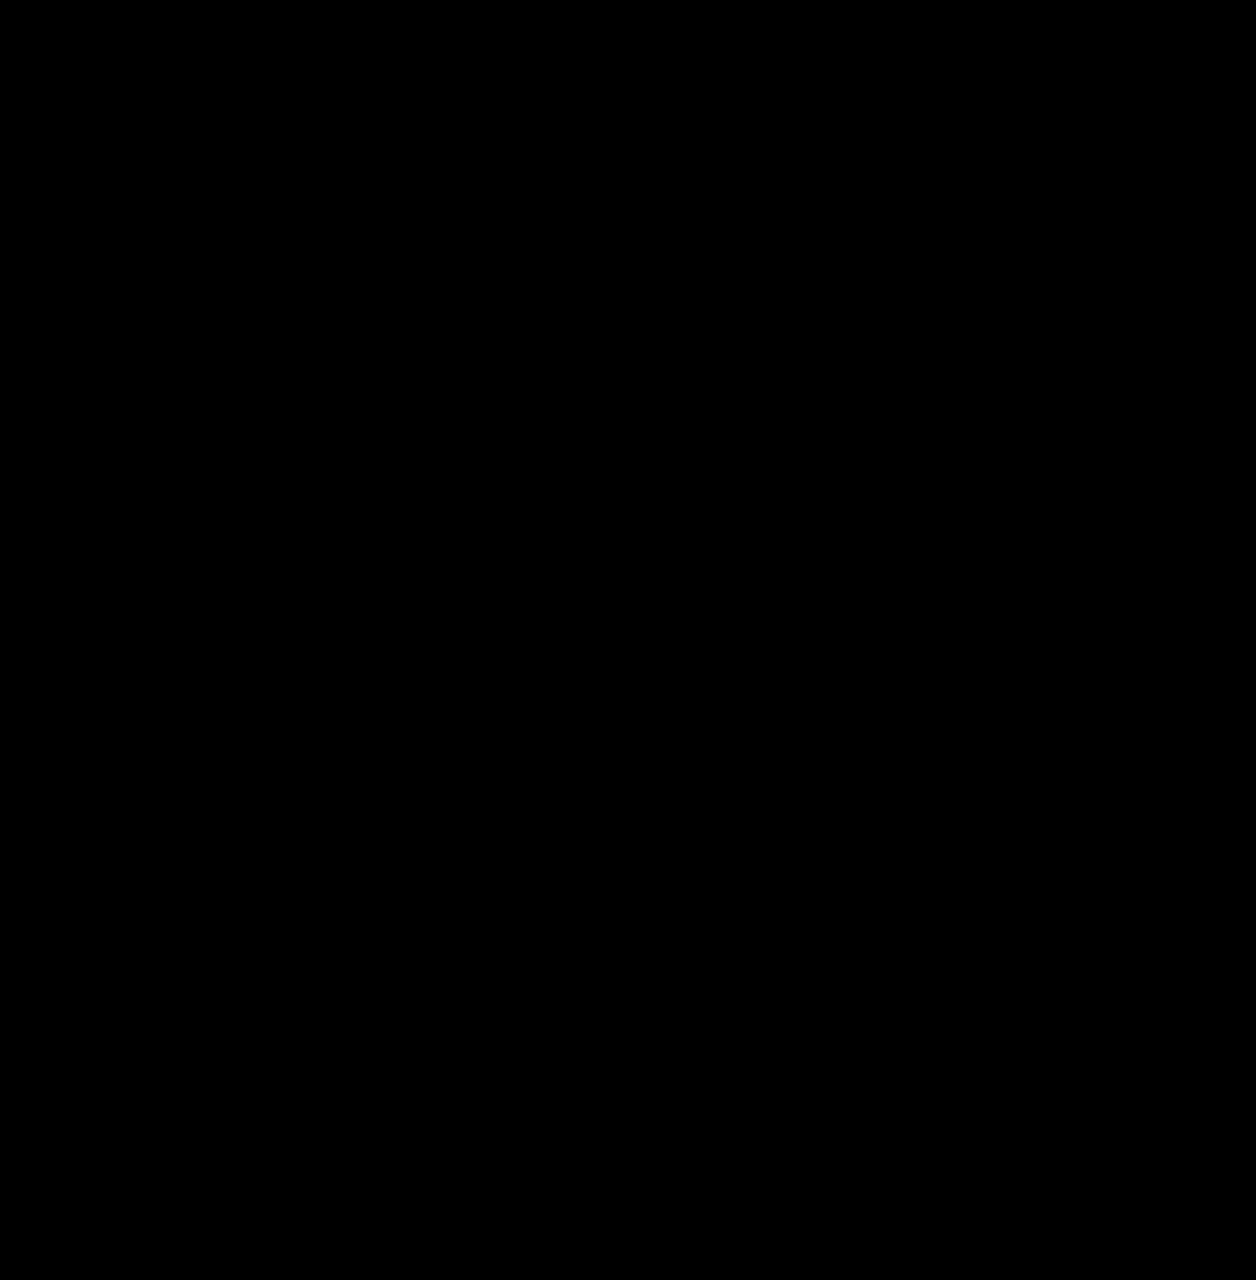 831x – 23